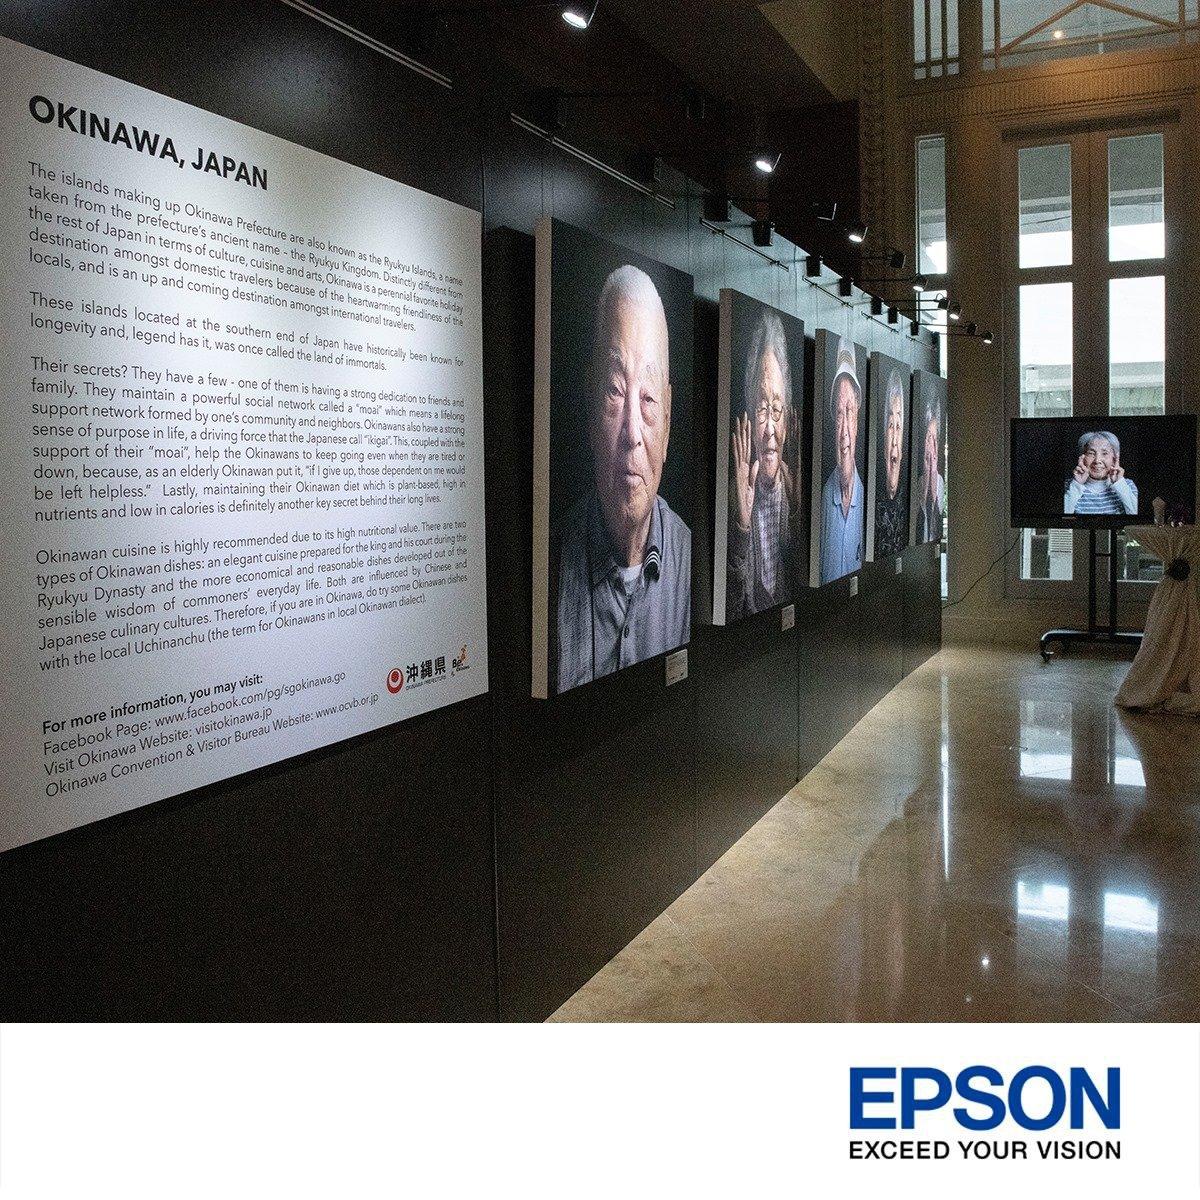 Epson printer photography exhibition singapore portrait print